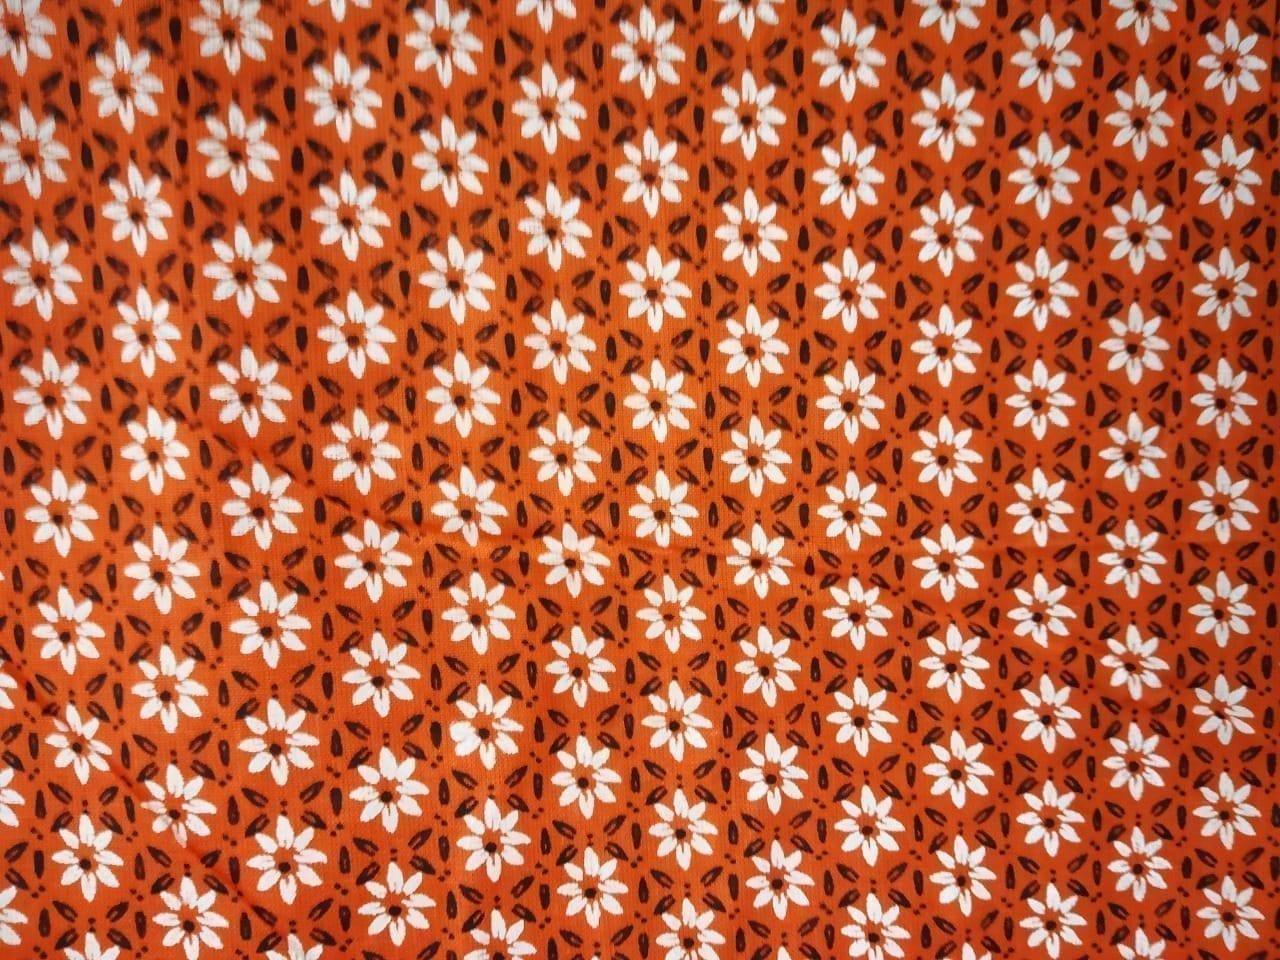 White Small Flowers on Orange Base Printed Cotton Fabric for bottom / Kurti PC400 1